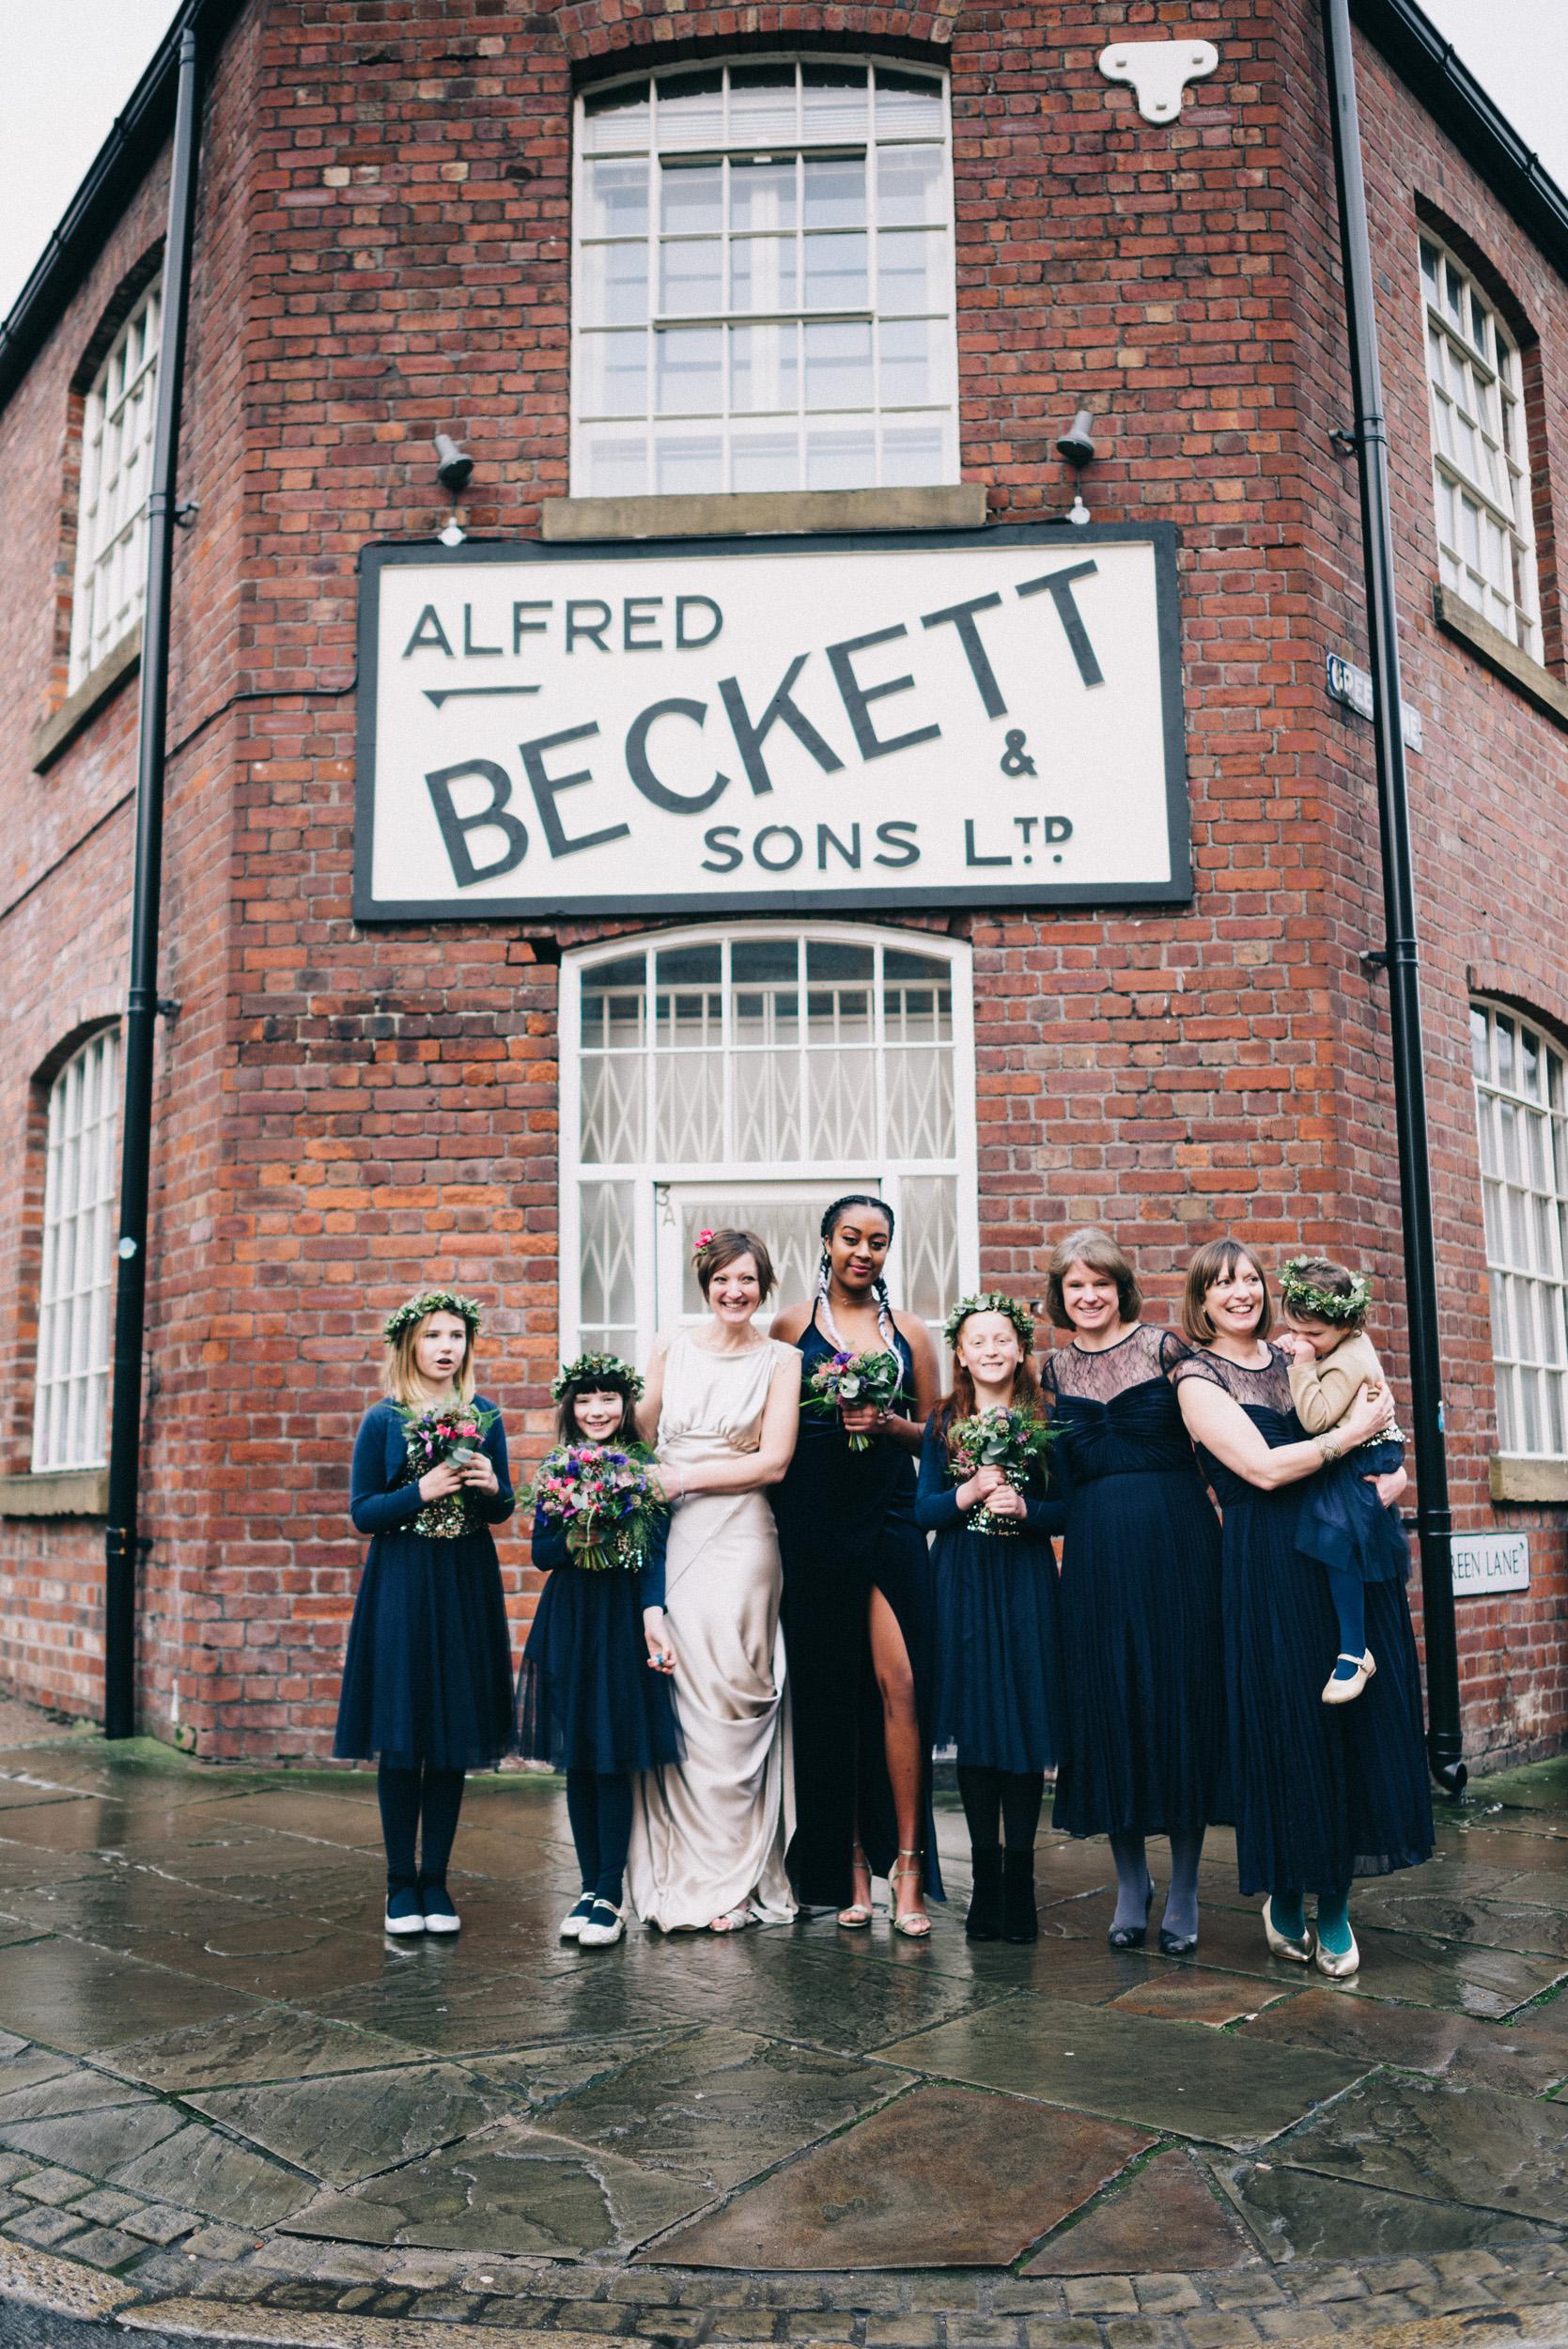 Alice-Bias-Cut-Silk-Wedding-Dress-Kate-Beaumont-Sheffield-Botanical-Gardens-by-Peakography-21.jpg